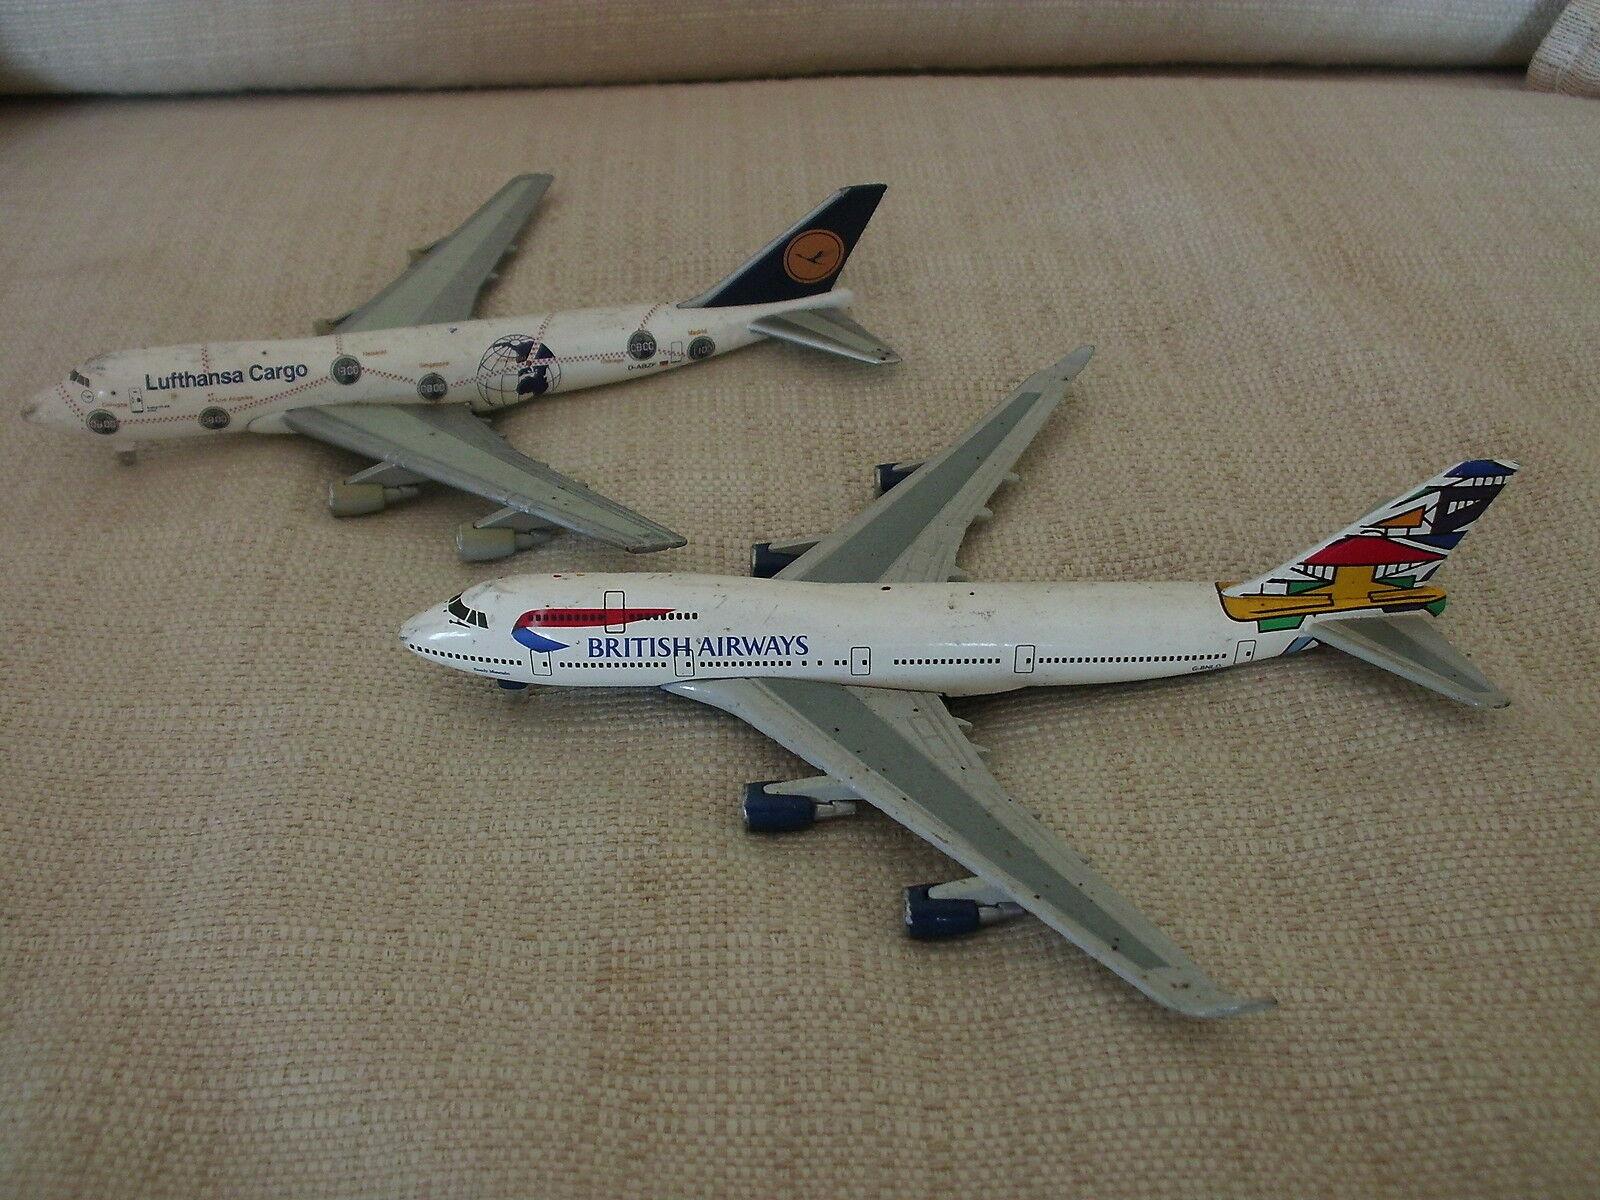 DUE MODELLINI IN METALLO AEROPLANI BRITSH AIRWAYS E LUFTHANSA CARGO D-ABZF